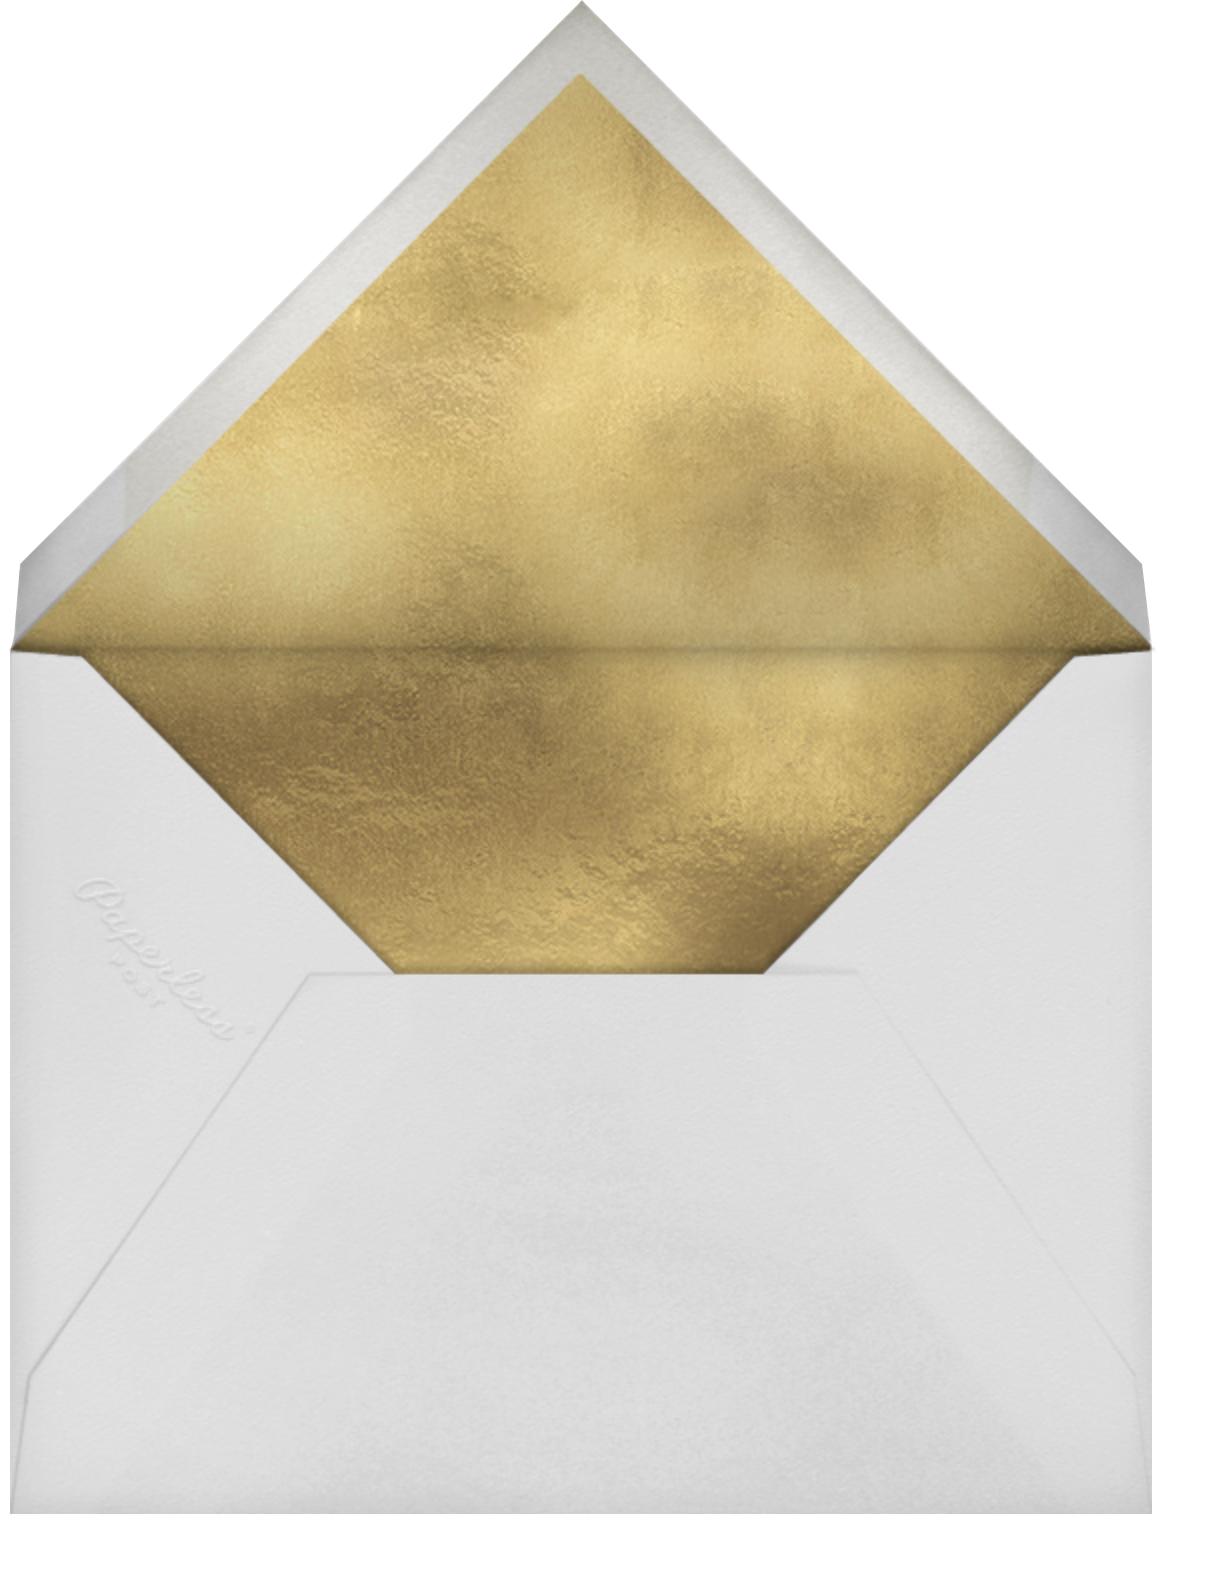 Noah's Arc - Rifle Paper Co. - Baby shower - envelope back